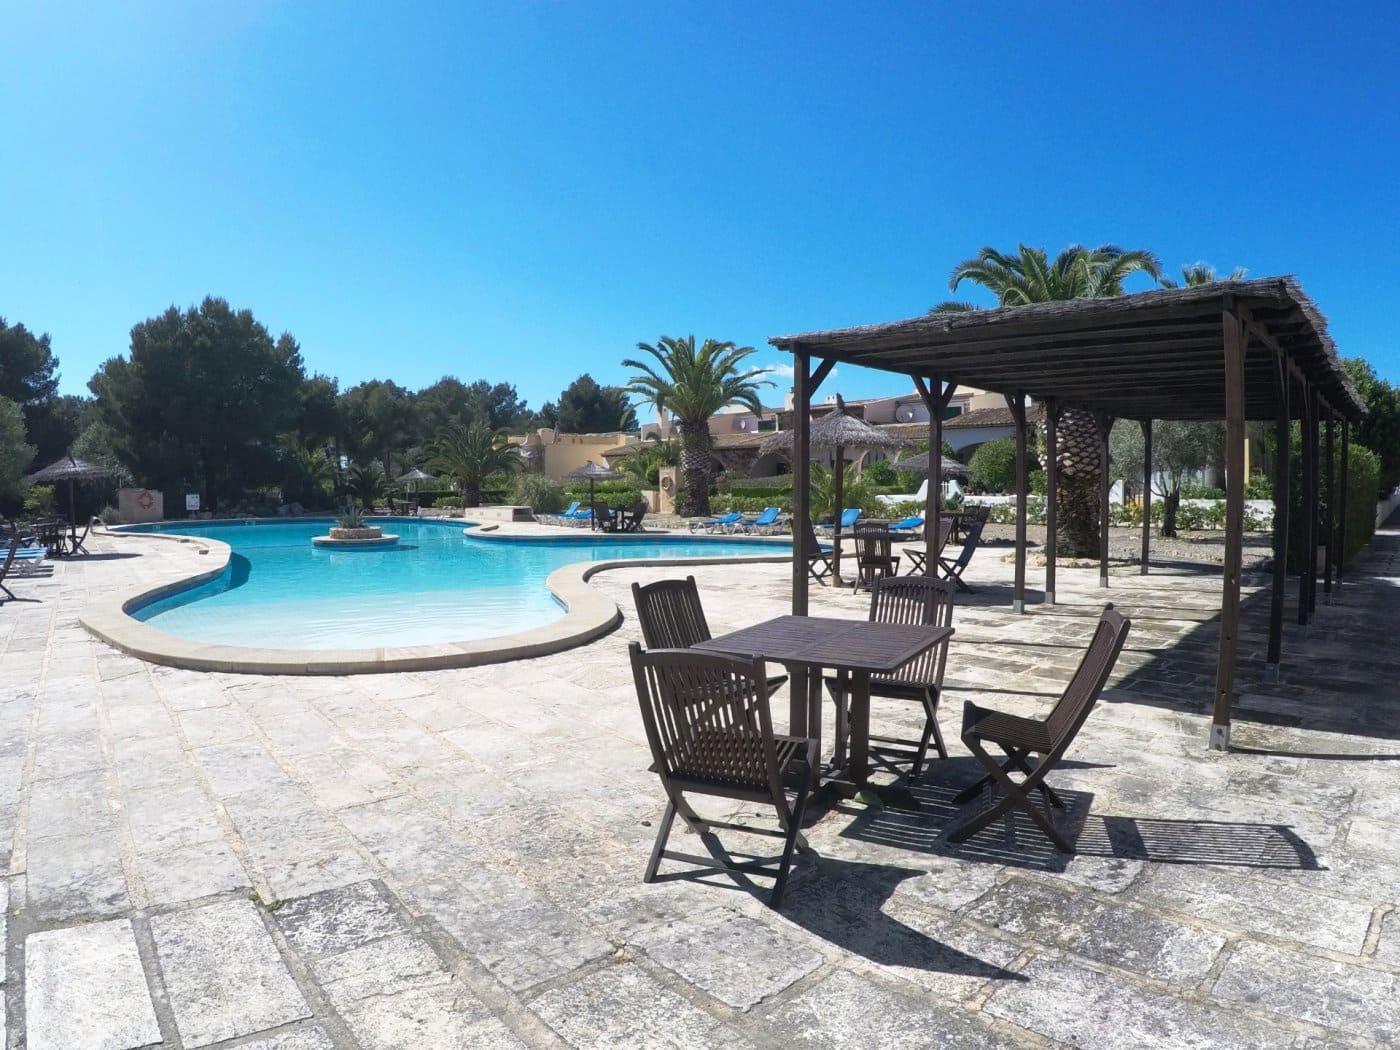 3 bedroom Terraced Villa for sale in Sa Rapita / La Rapita with pool - € 254,000 (Ref: 4101106)